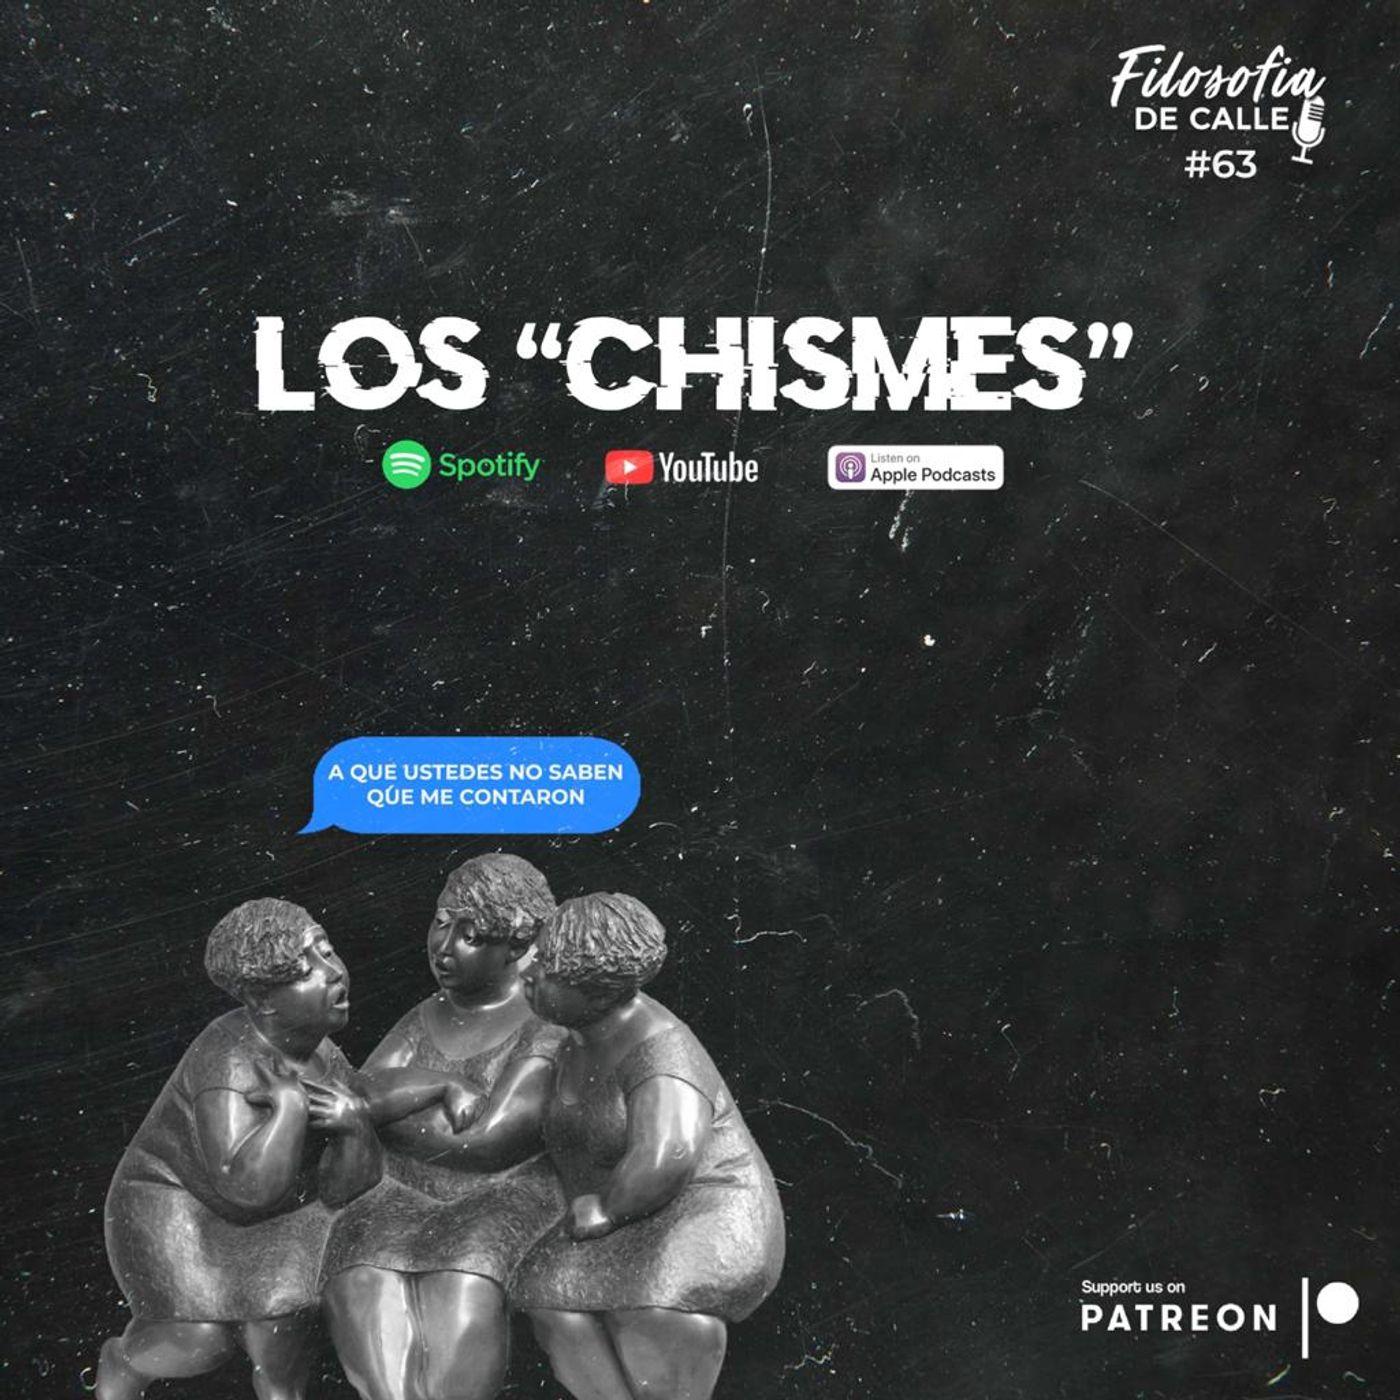 063. LOS CHISMES